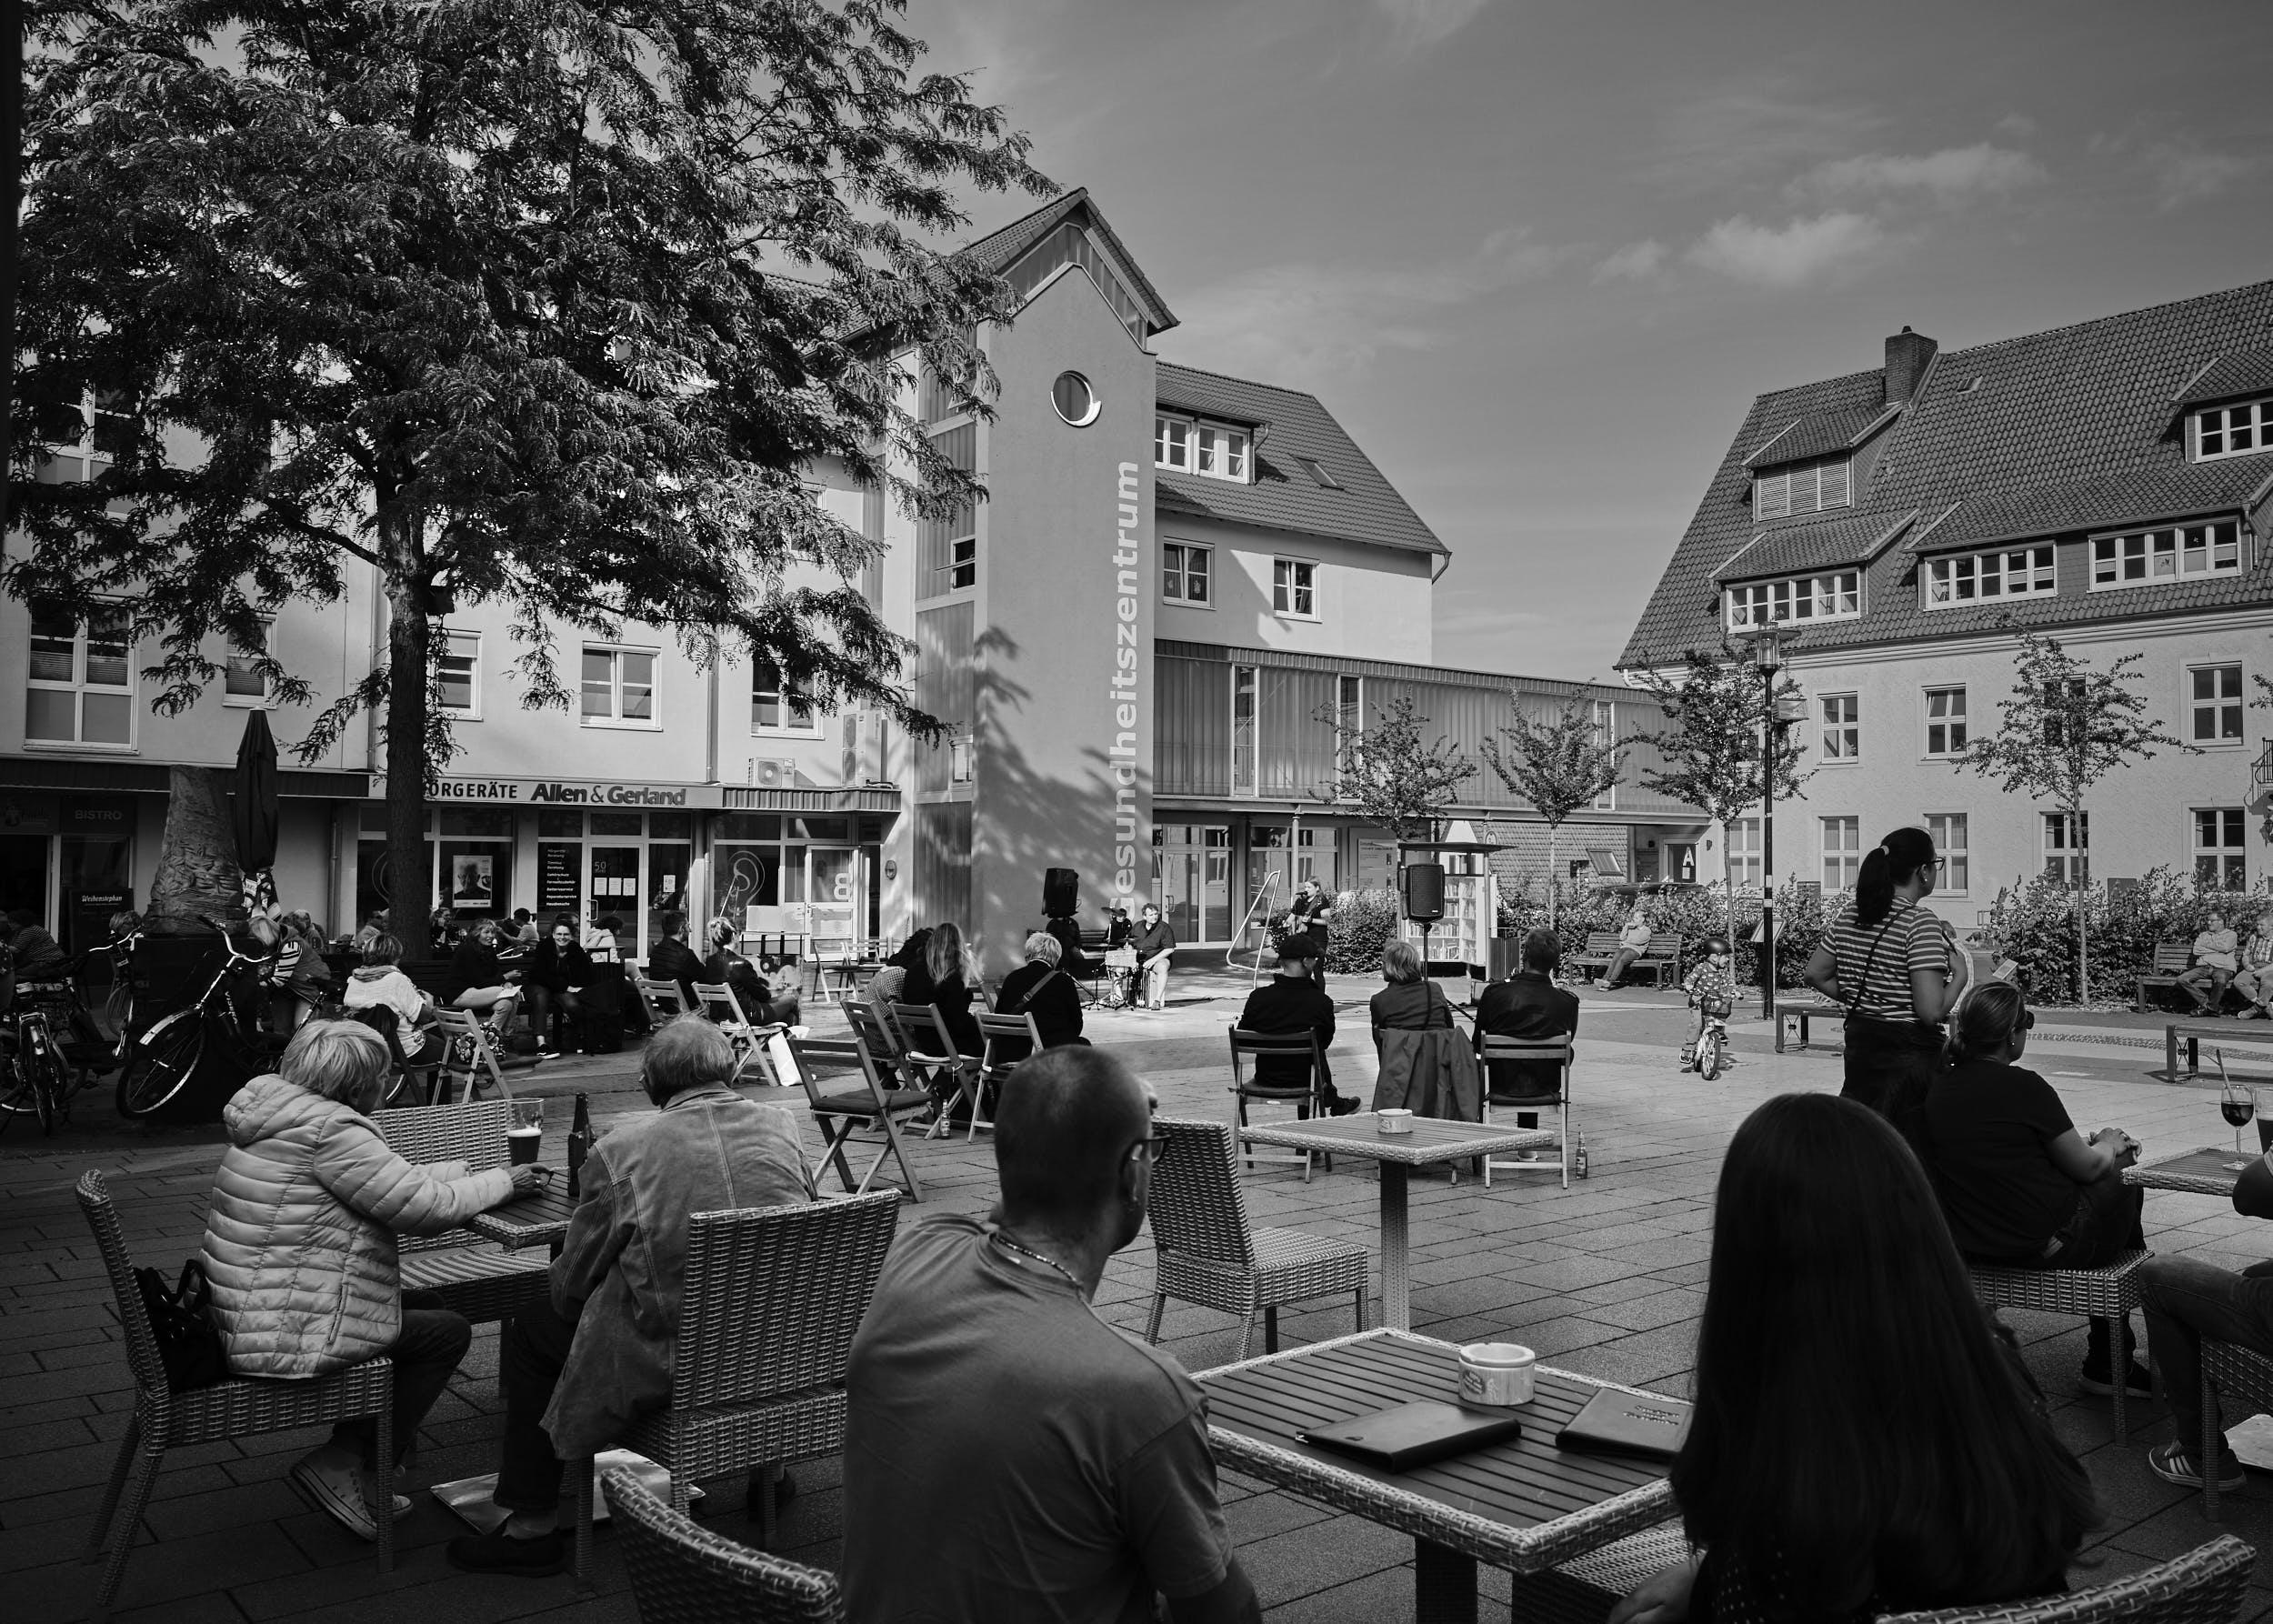 Kultursommer Vlotho, Sommerfelder Platz